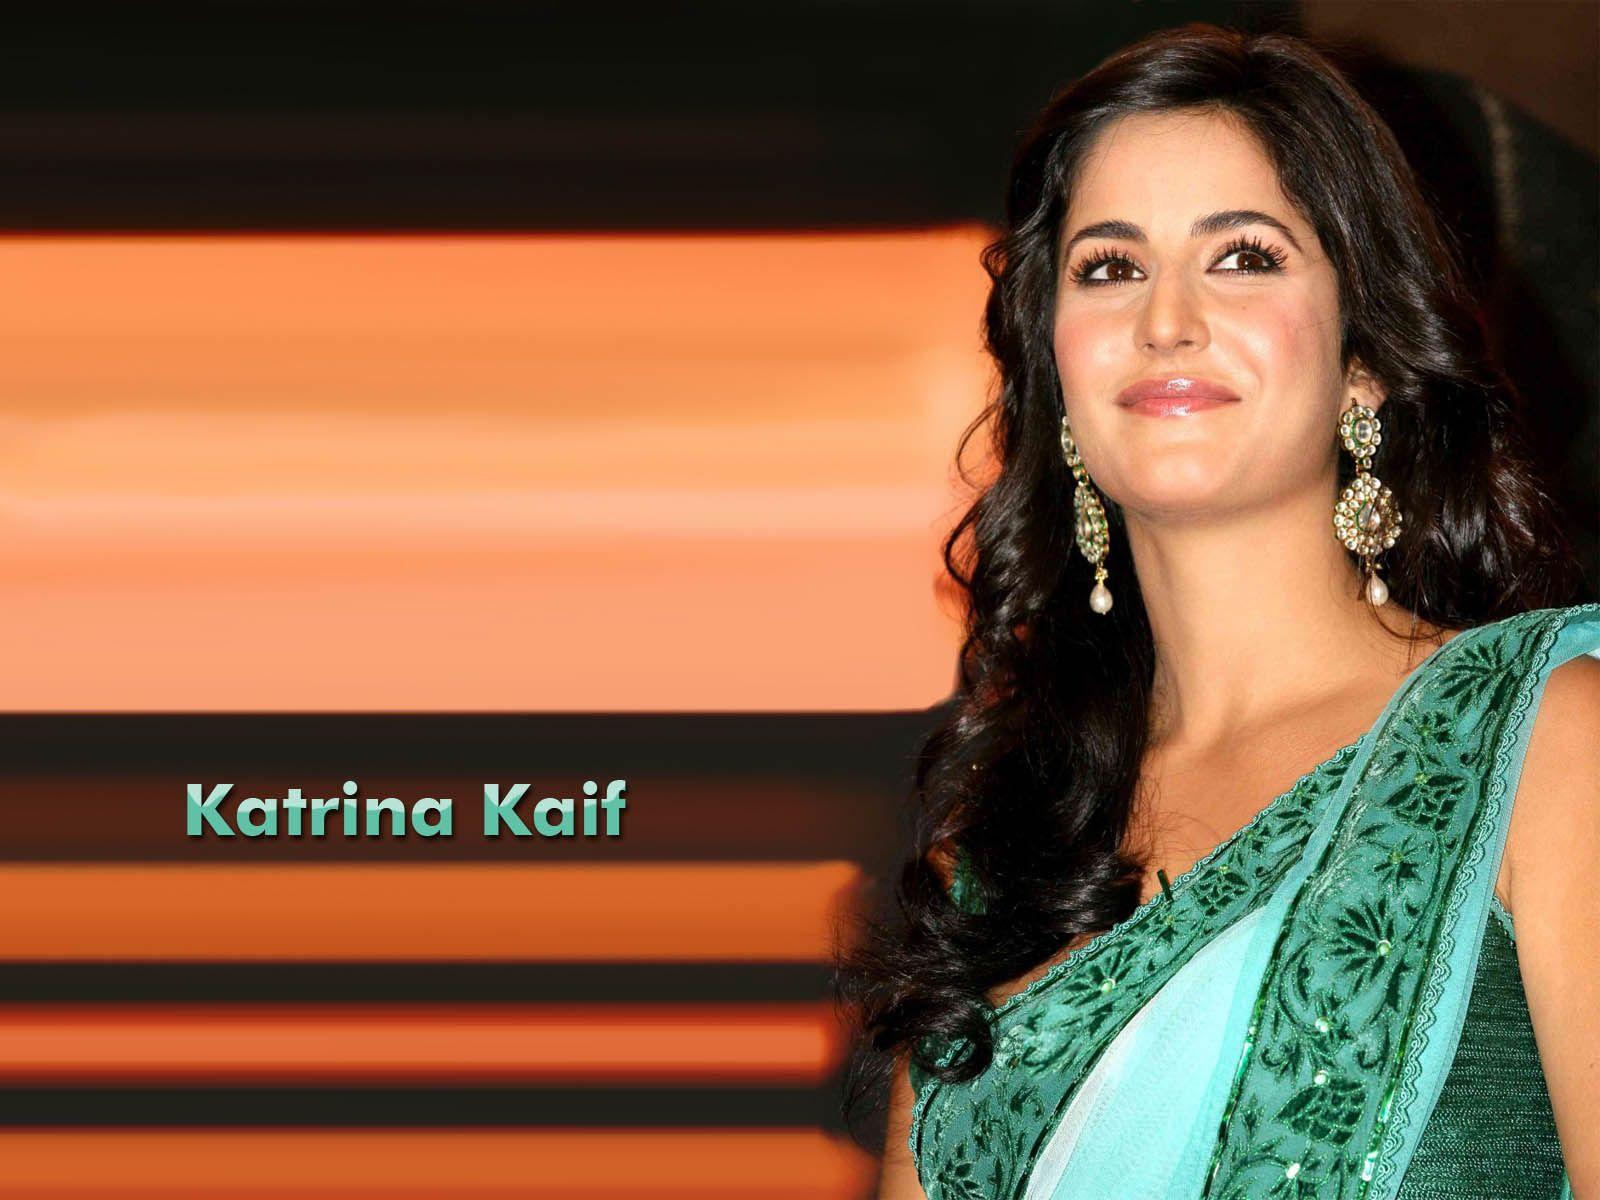 Download katrina kaif desktop wallpaer - Undefined Katrina Kaif Picture Wallpapers 76 Wallpapers Adorable Wallpapers